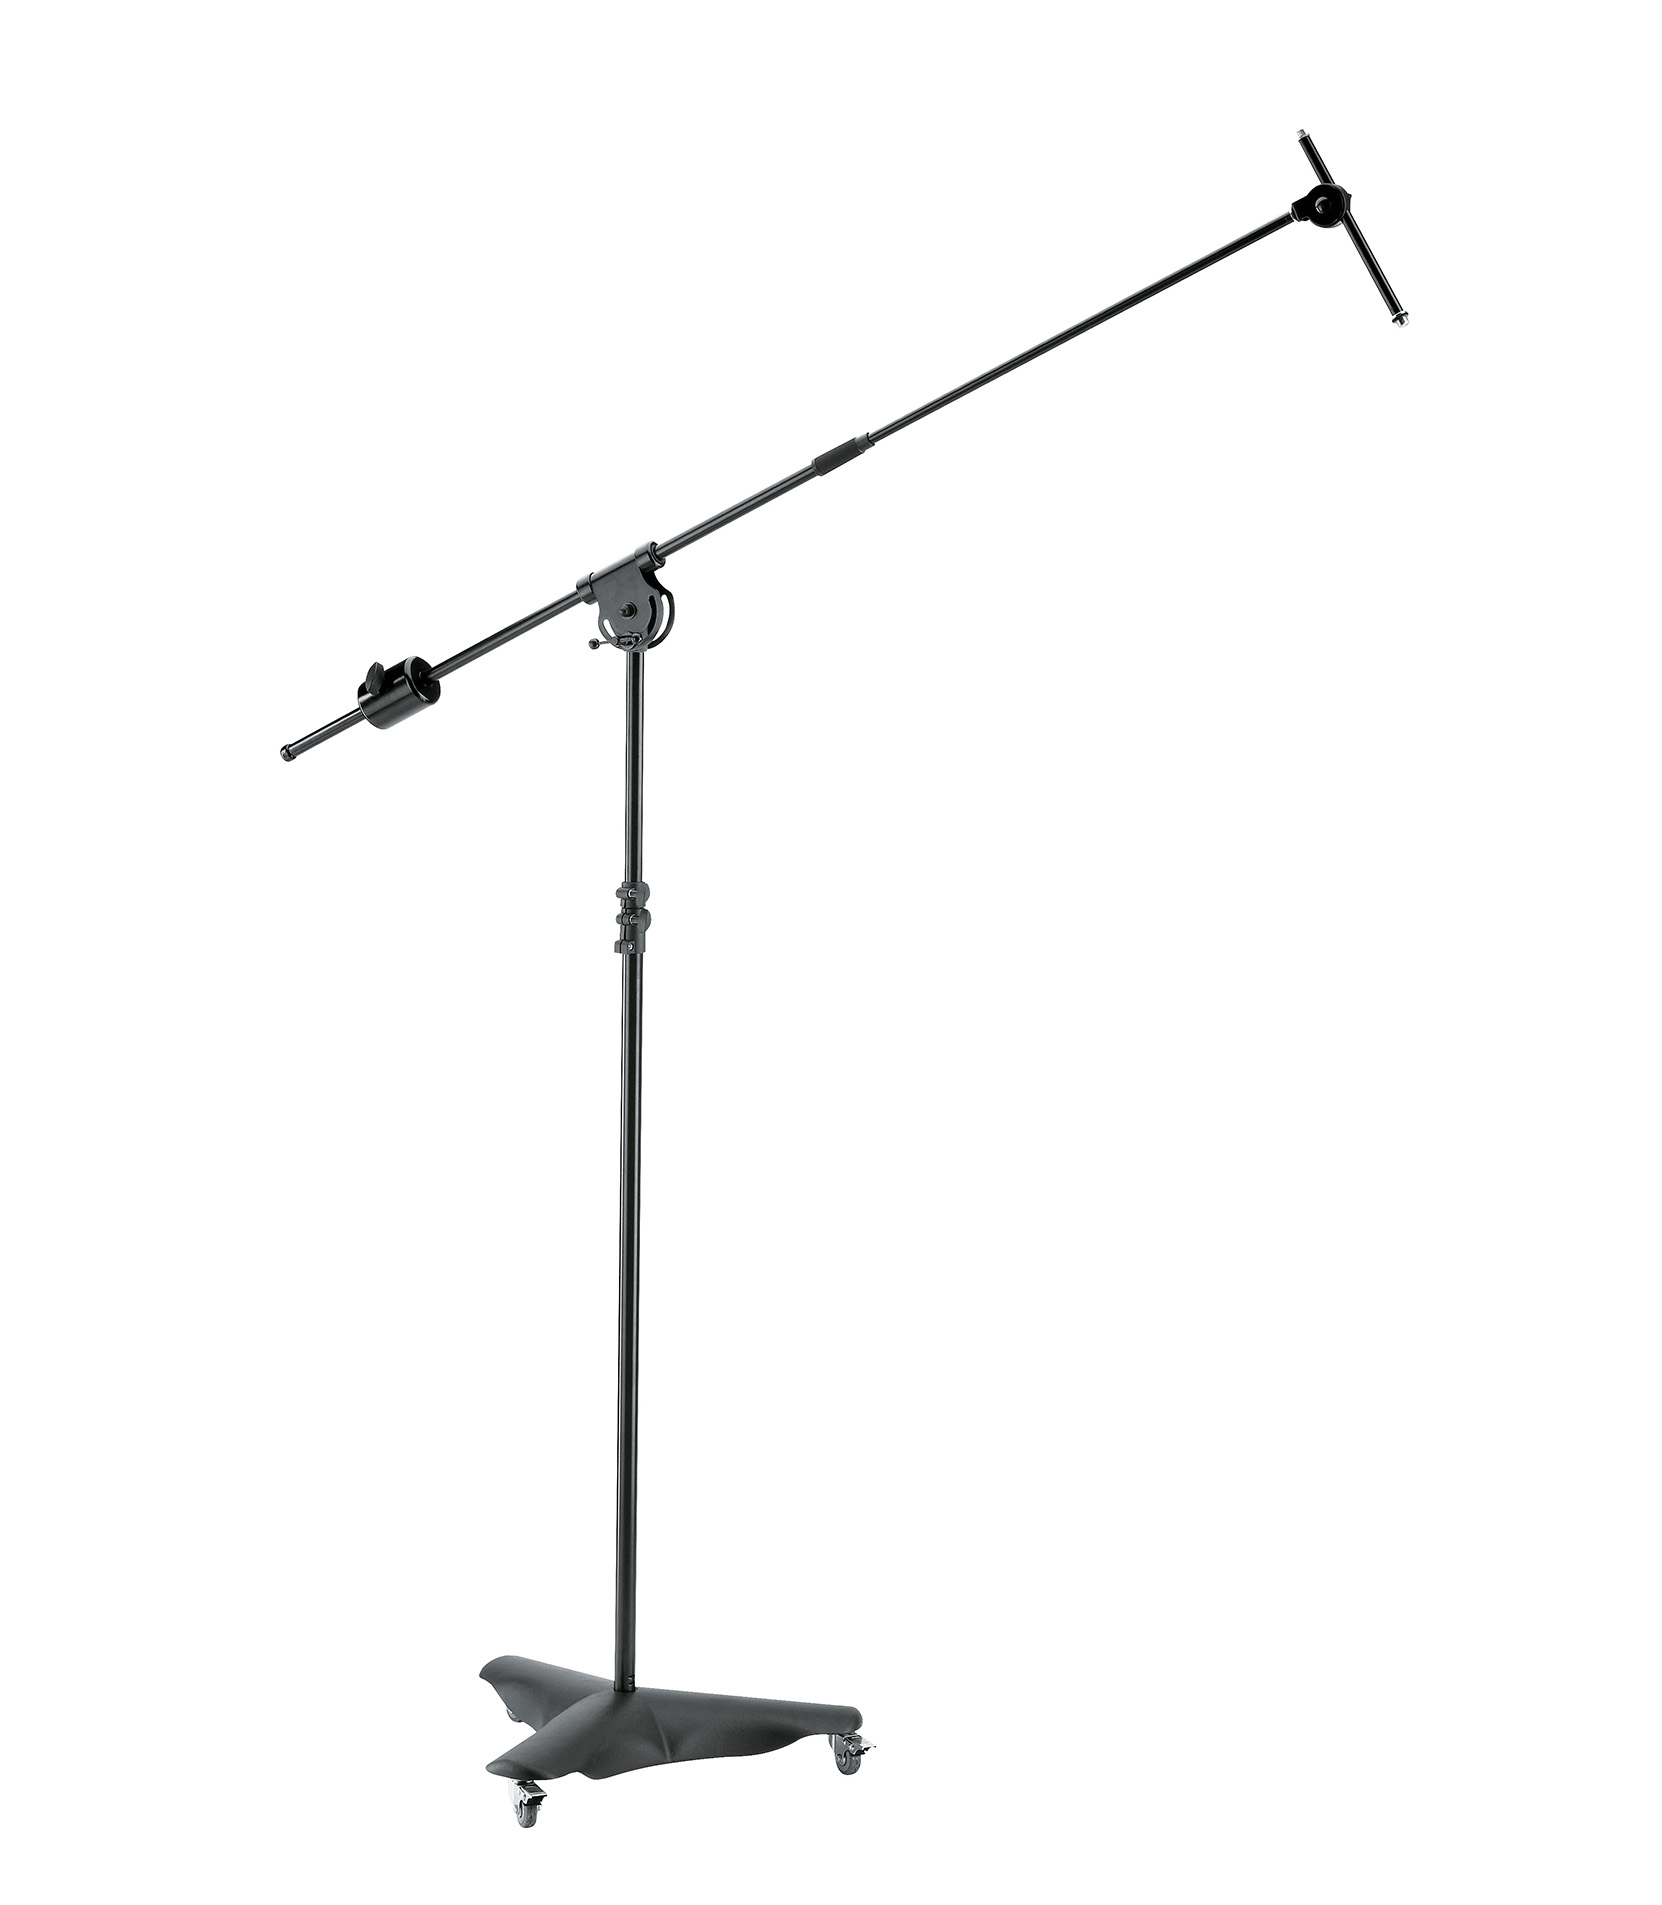 buy k&m 21430 500 55 overhead microphone standblack